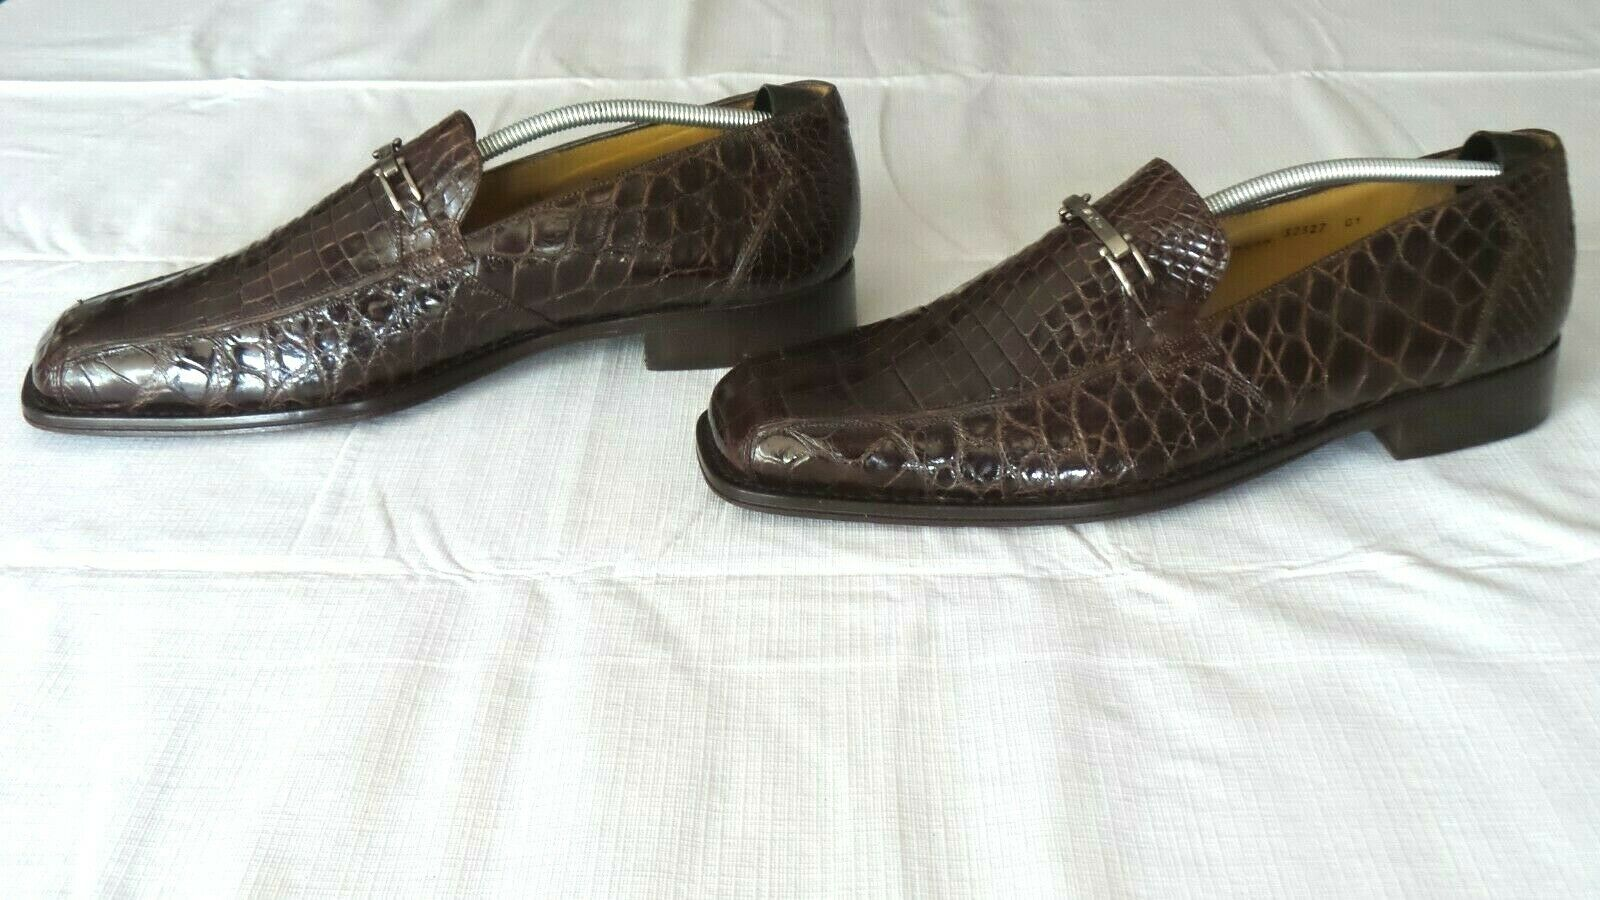 NICE   1000 MEZLAN PLATINUM marrón Genuine Crocodile Alligator Loafers botas zapatos